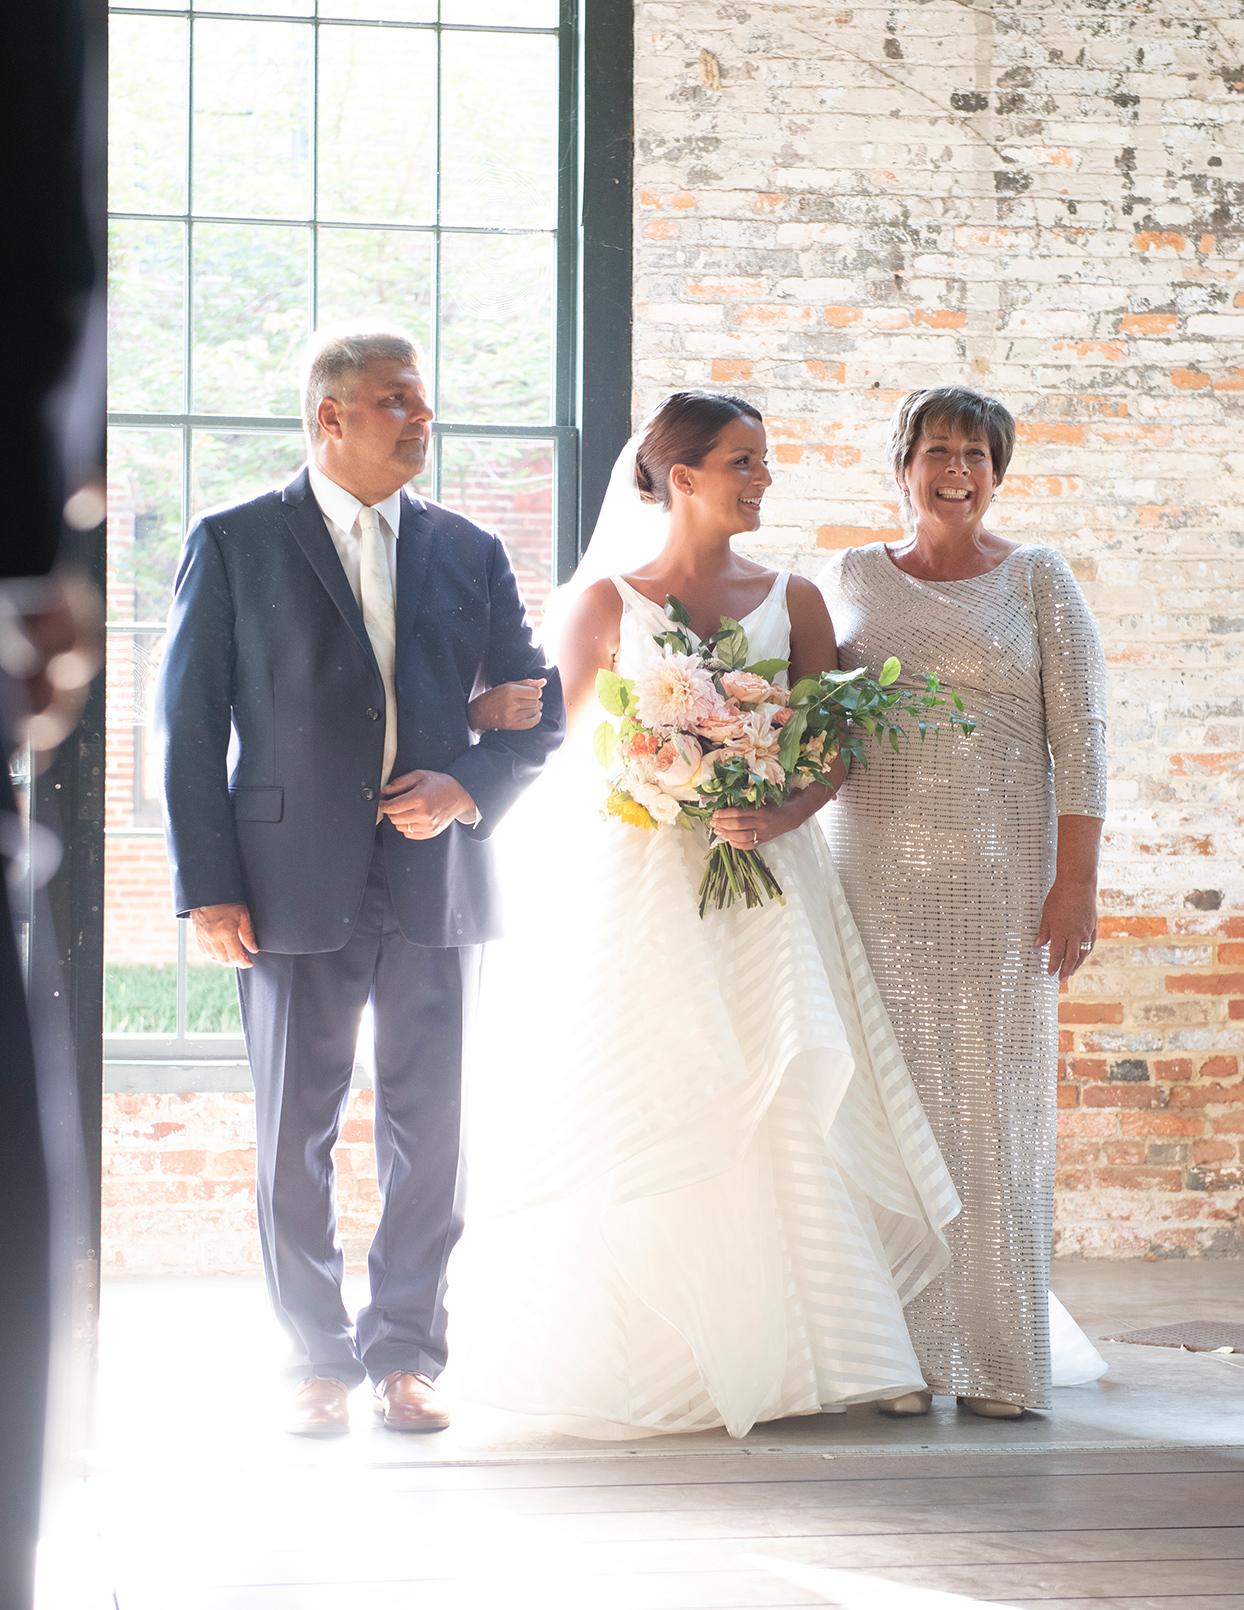 shelby david wedding ceremony bride entrance with parents